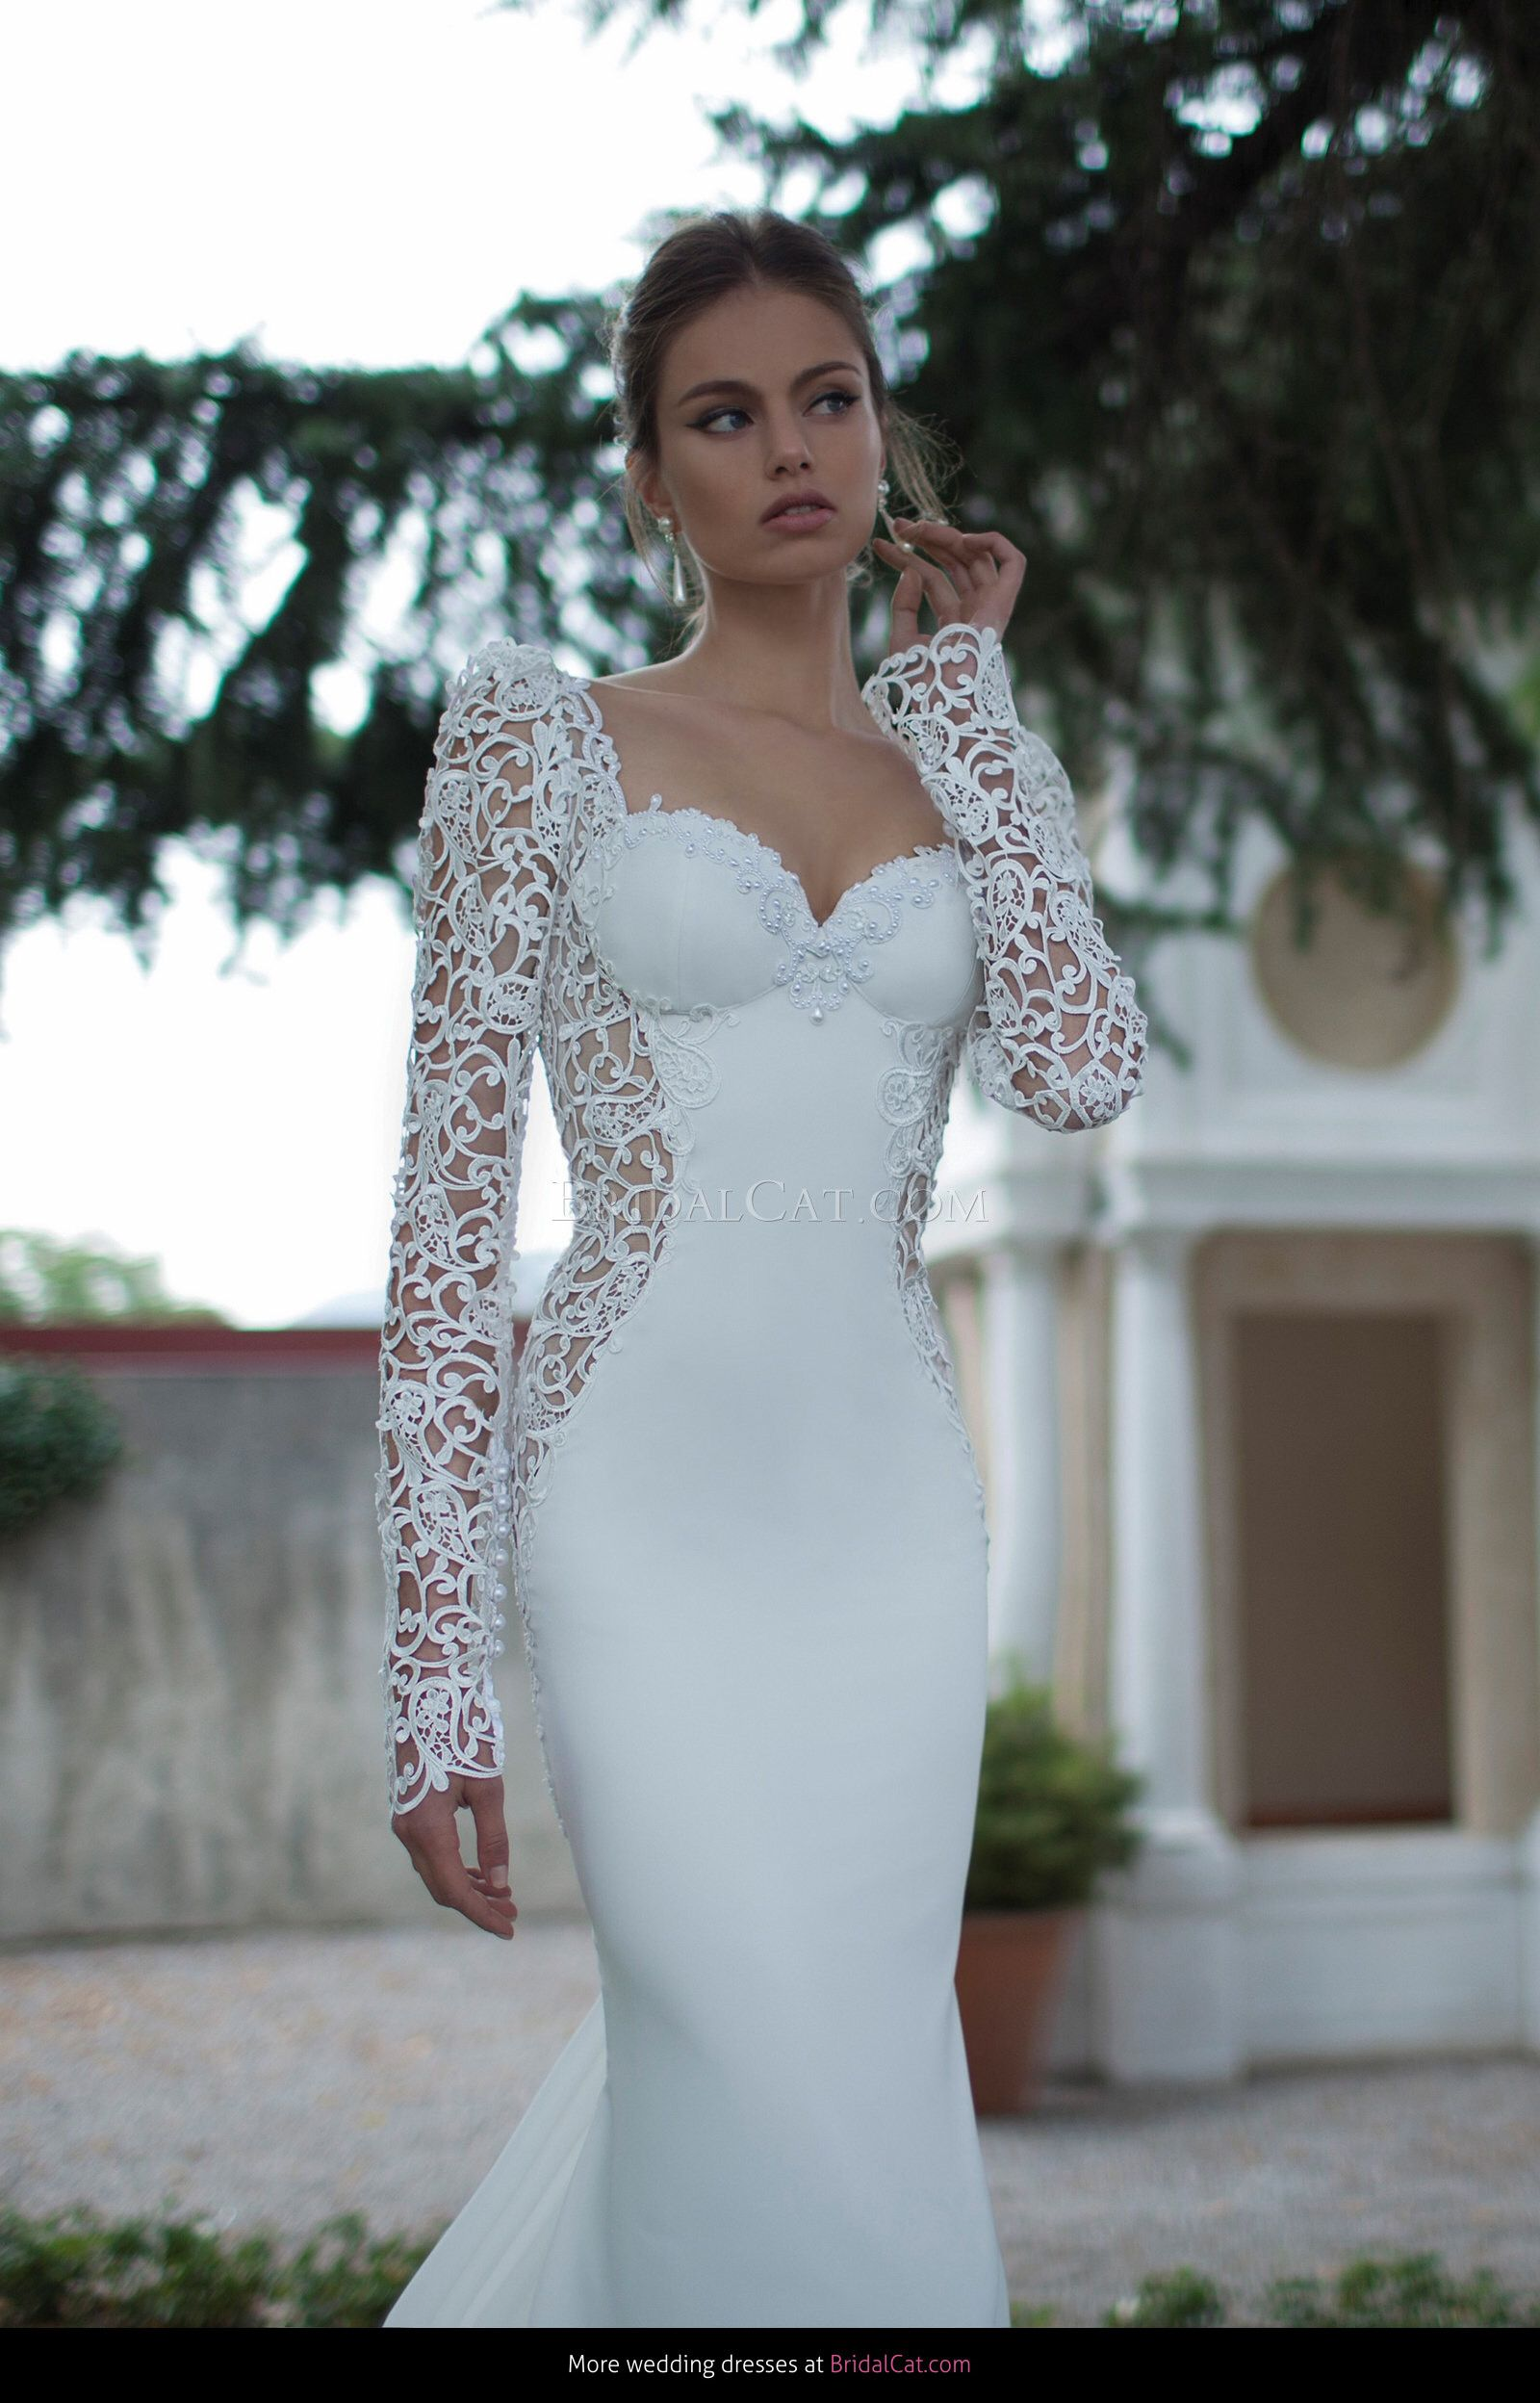 Wedding Dress   Wedding ideas   Pinterest   Wedding dress, Weddings ...